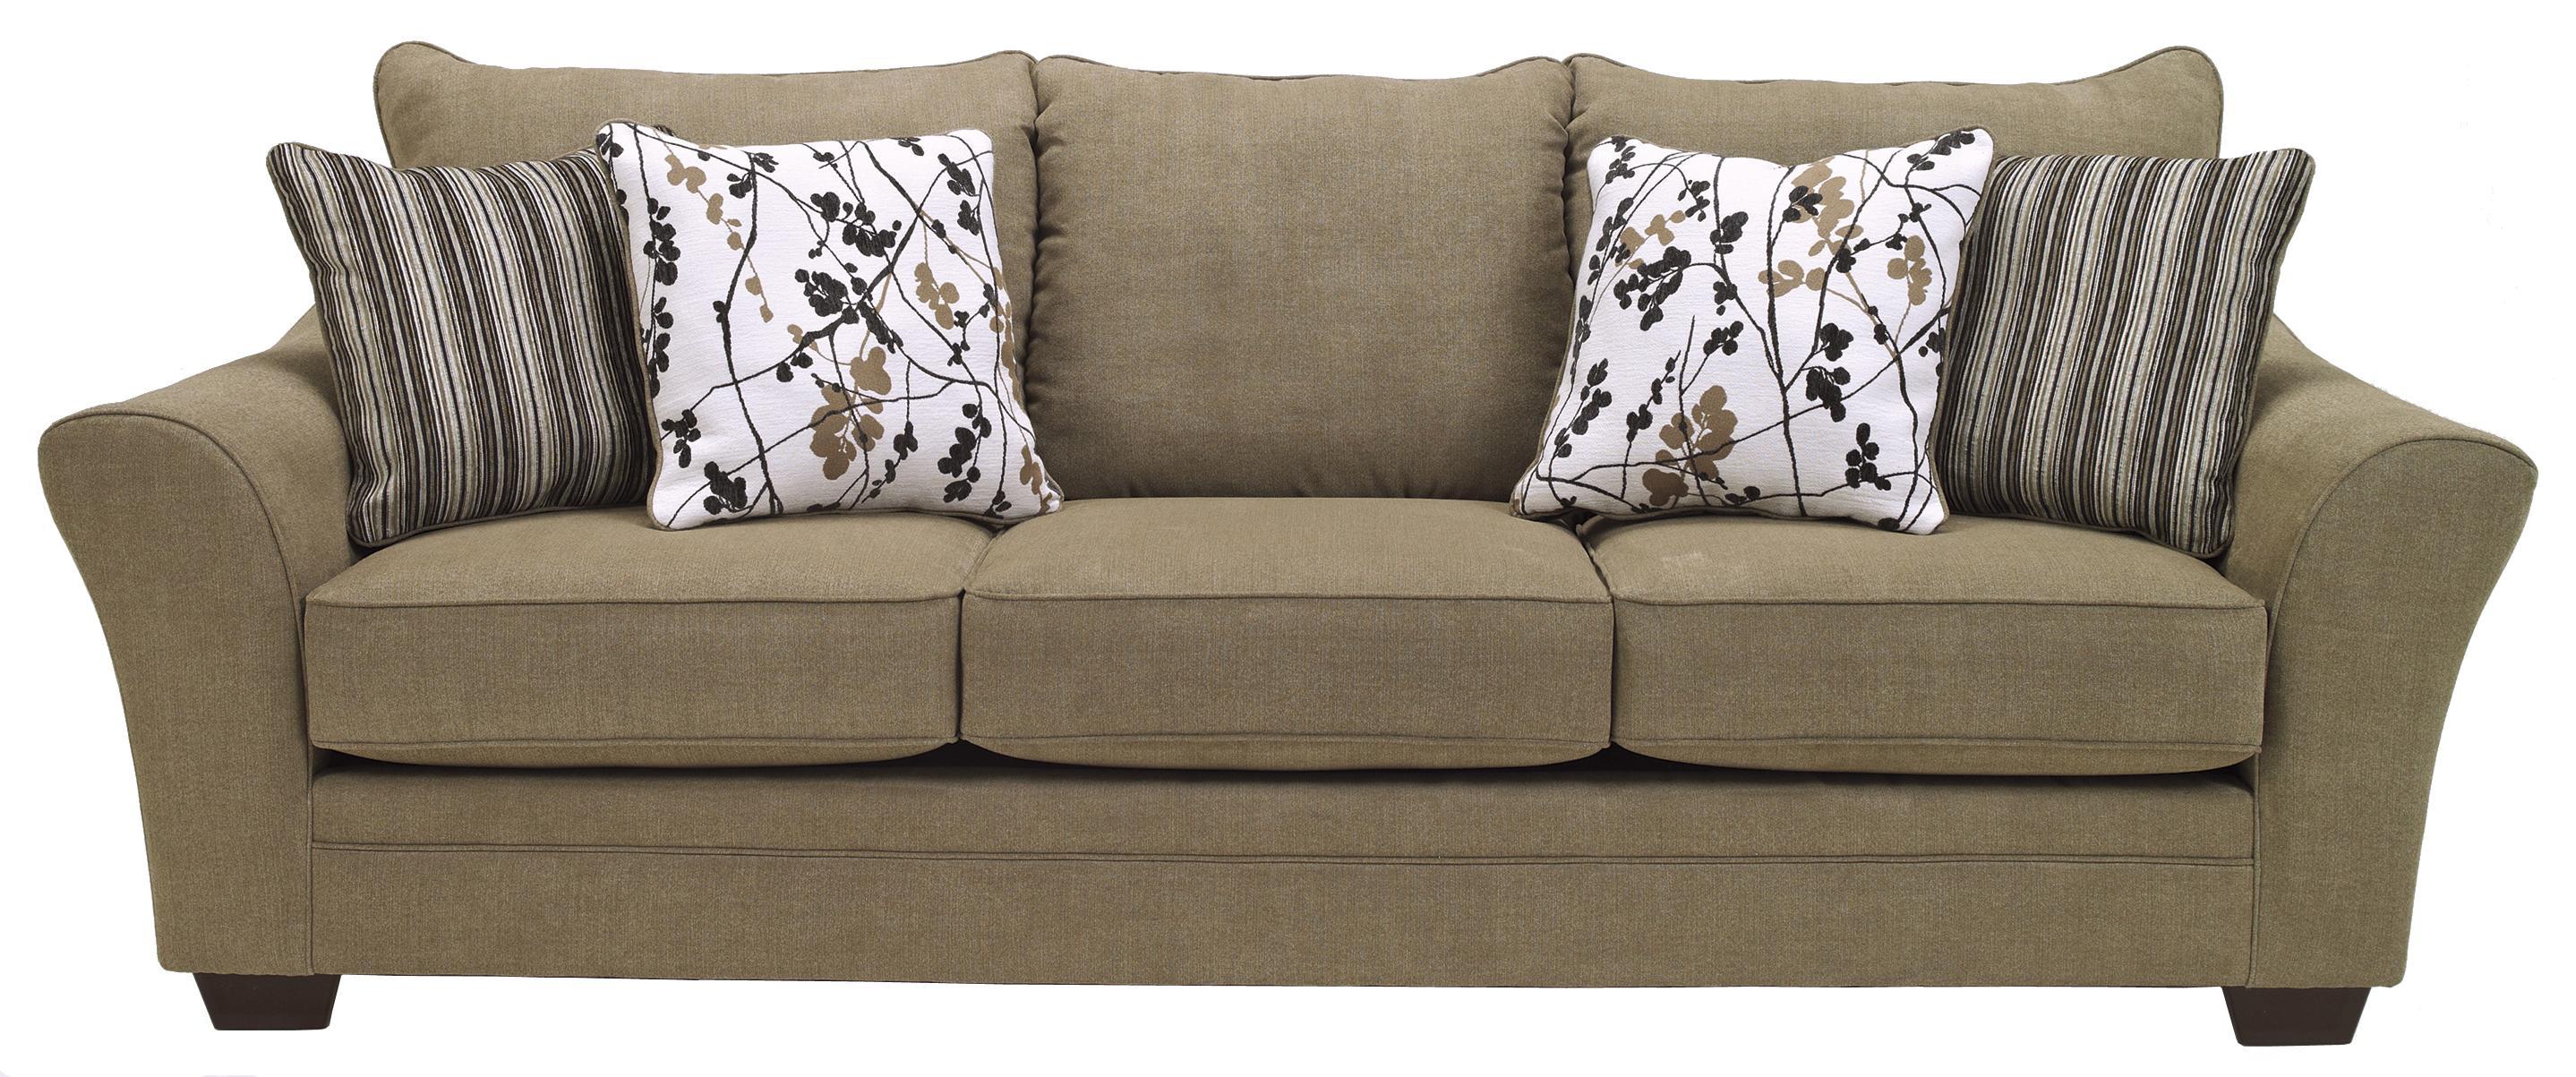 Signature Design by Ashley Mykla Shitake Contemporary Sofa